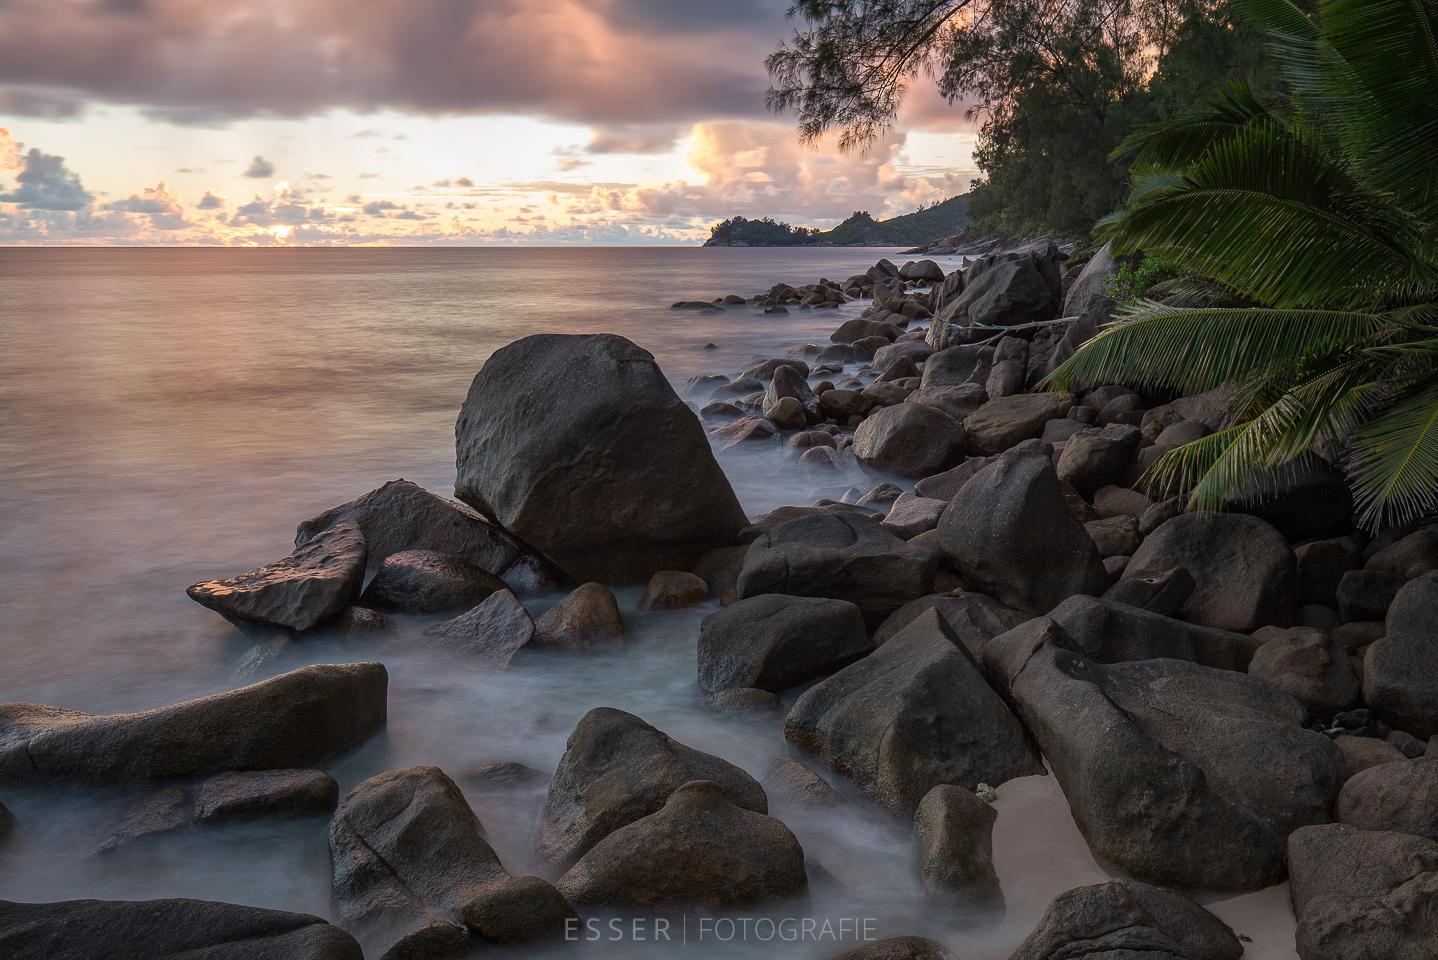 esser-fotografie-seychellen-daemmerung